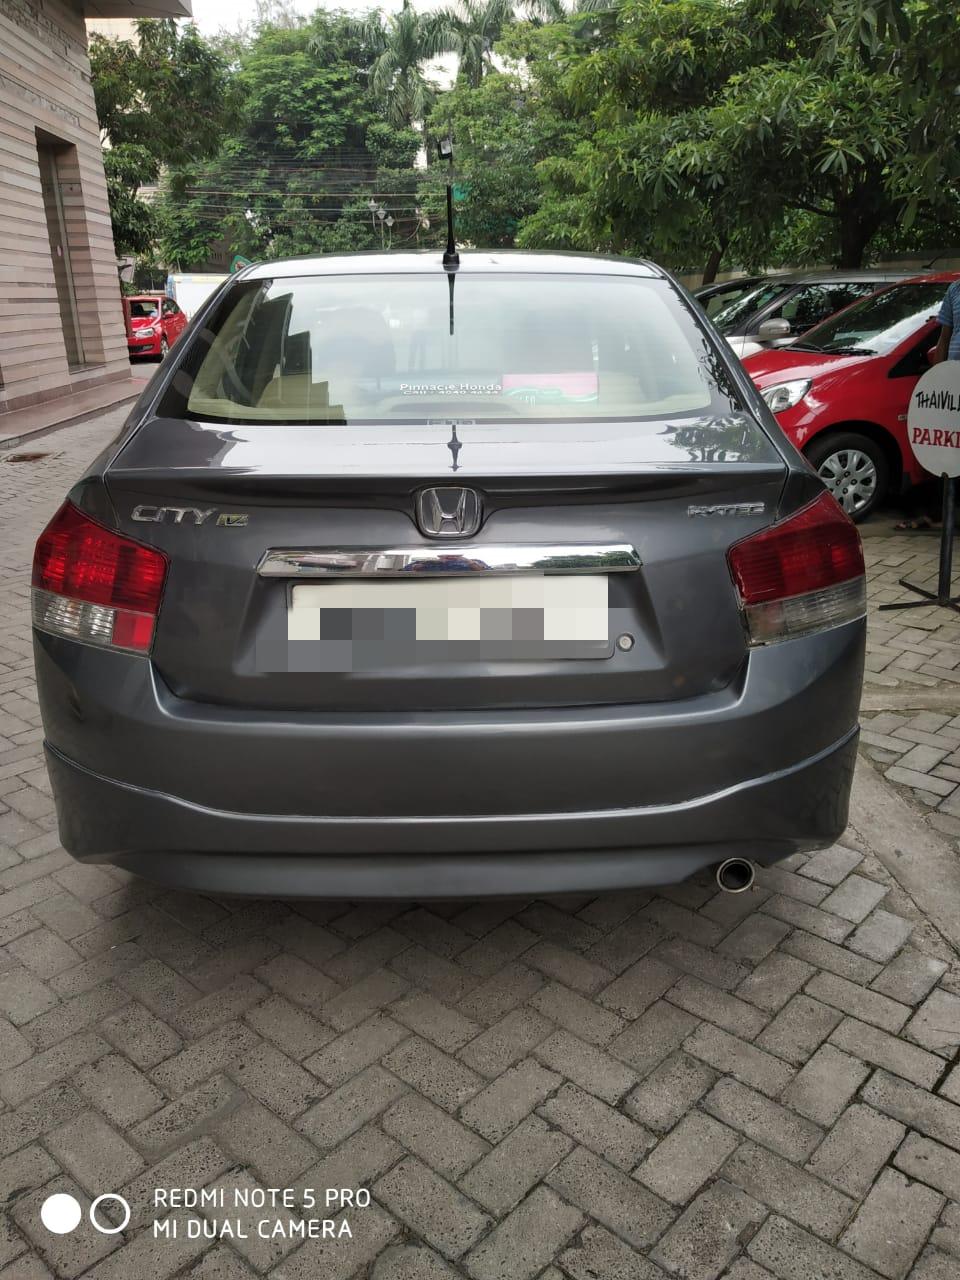 2010 Used Honda City 1.5 V MT